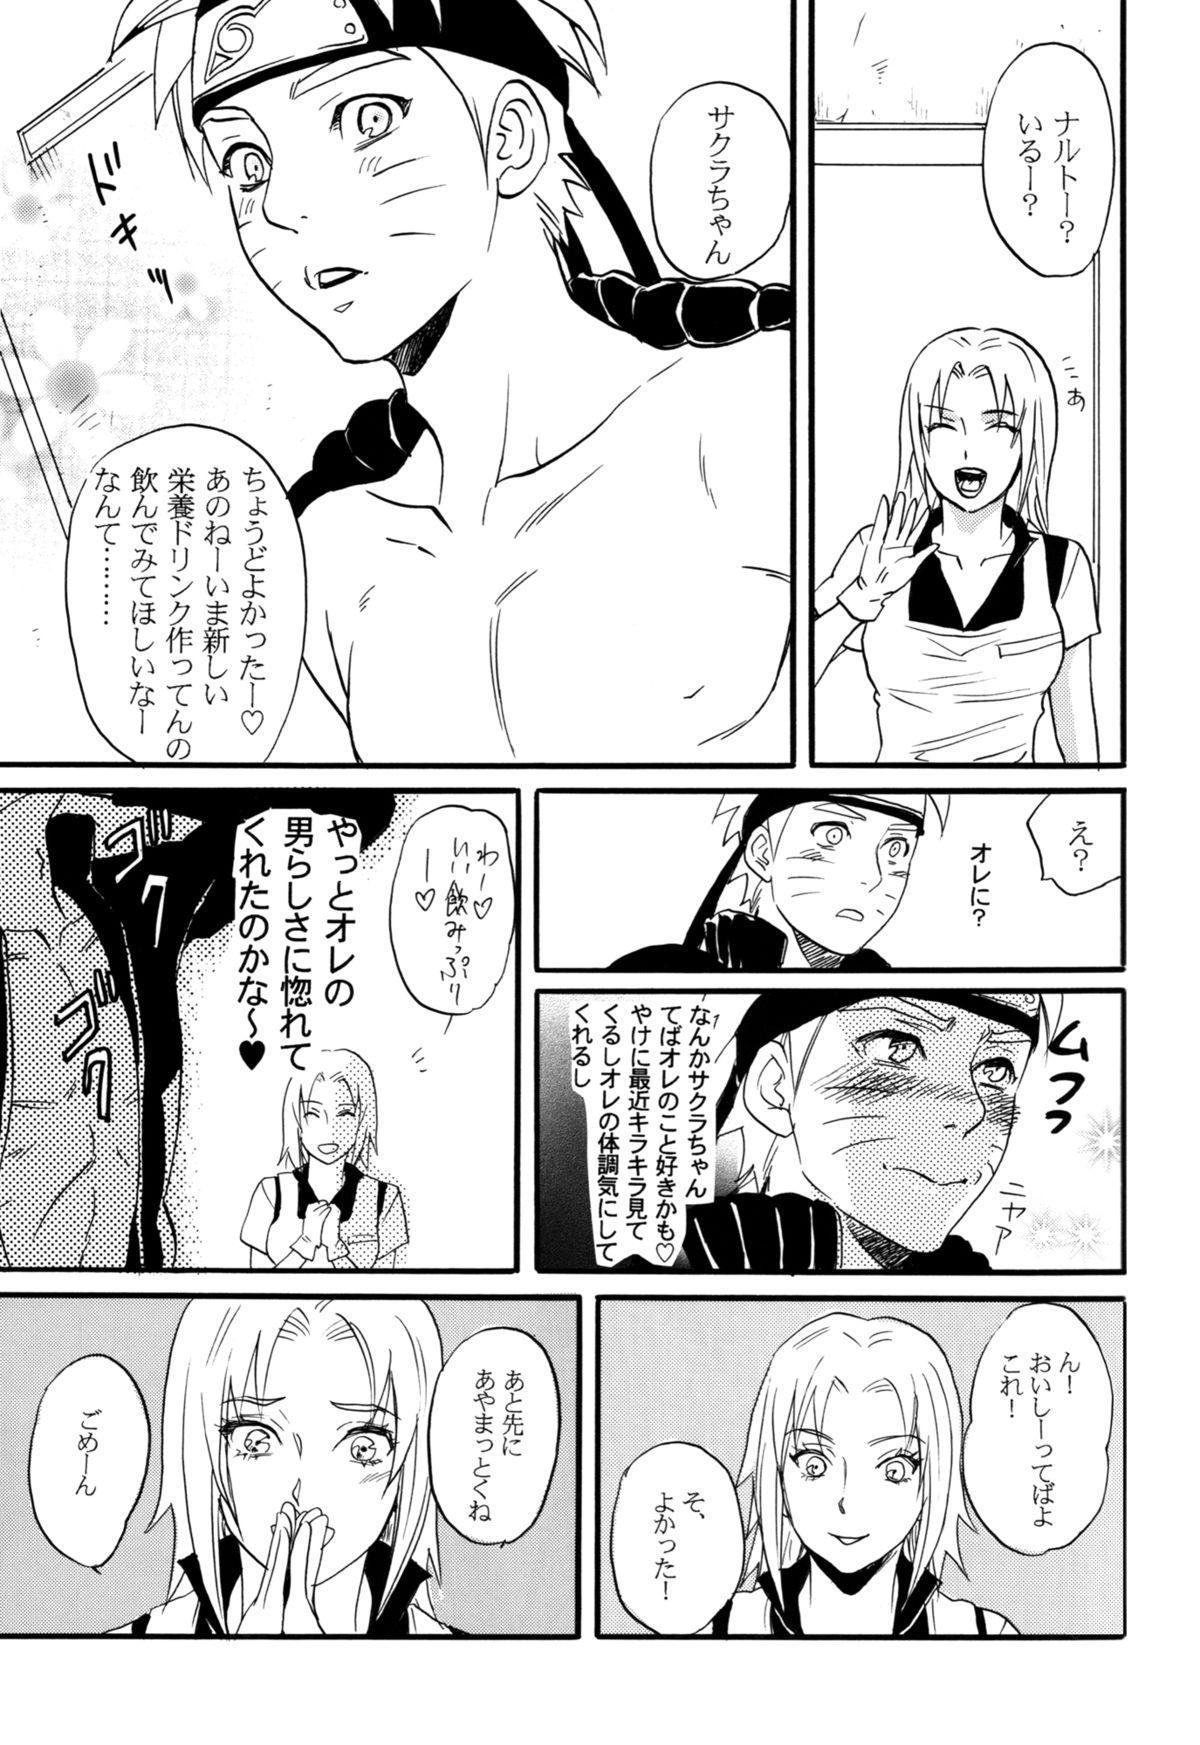 Three-Man Cell ga Iroiro Okashii 2